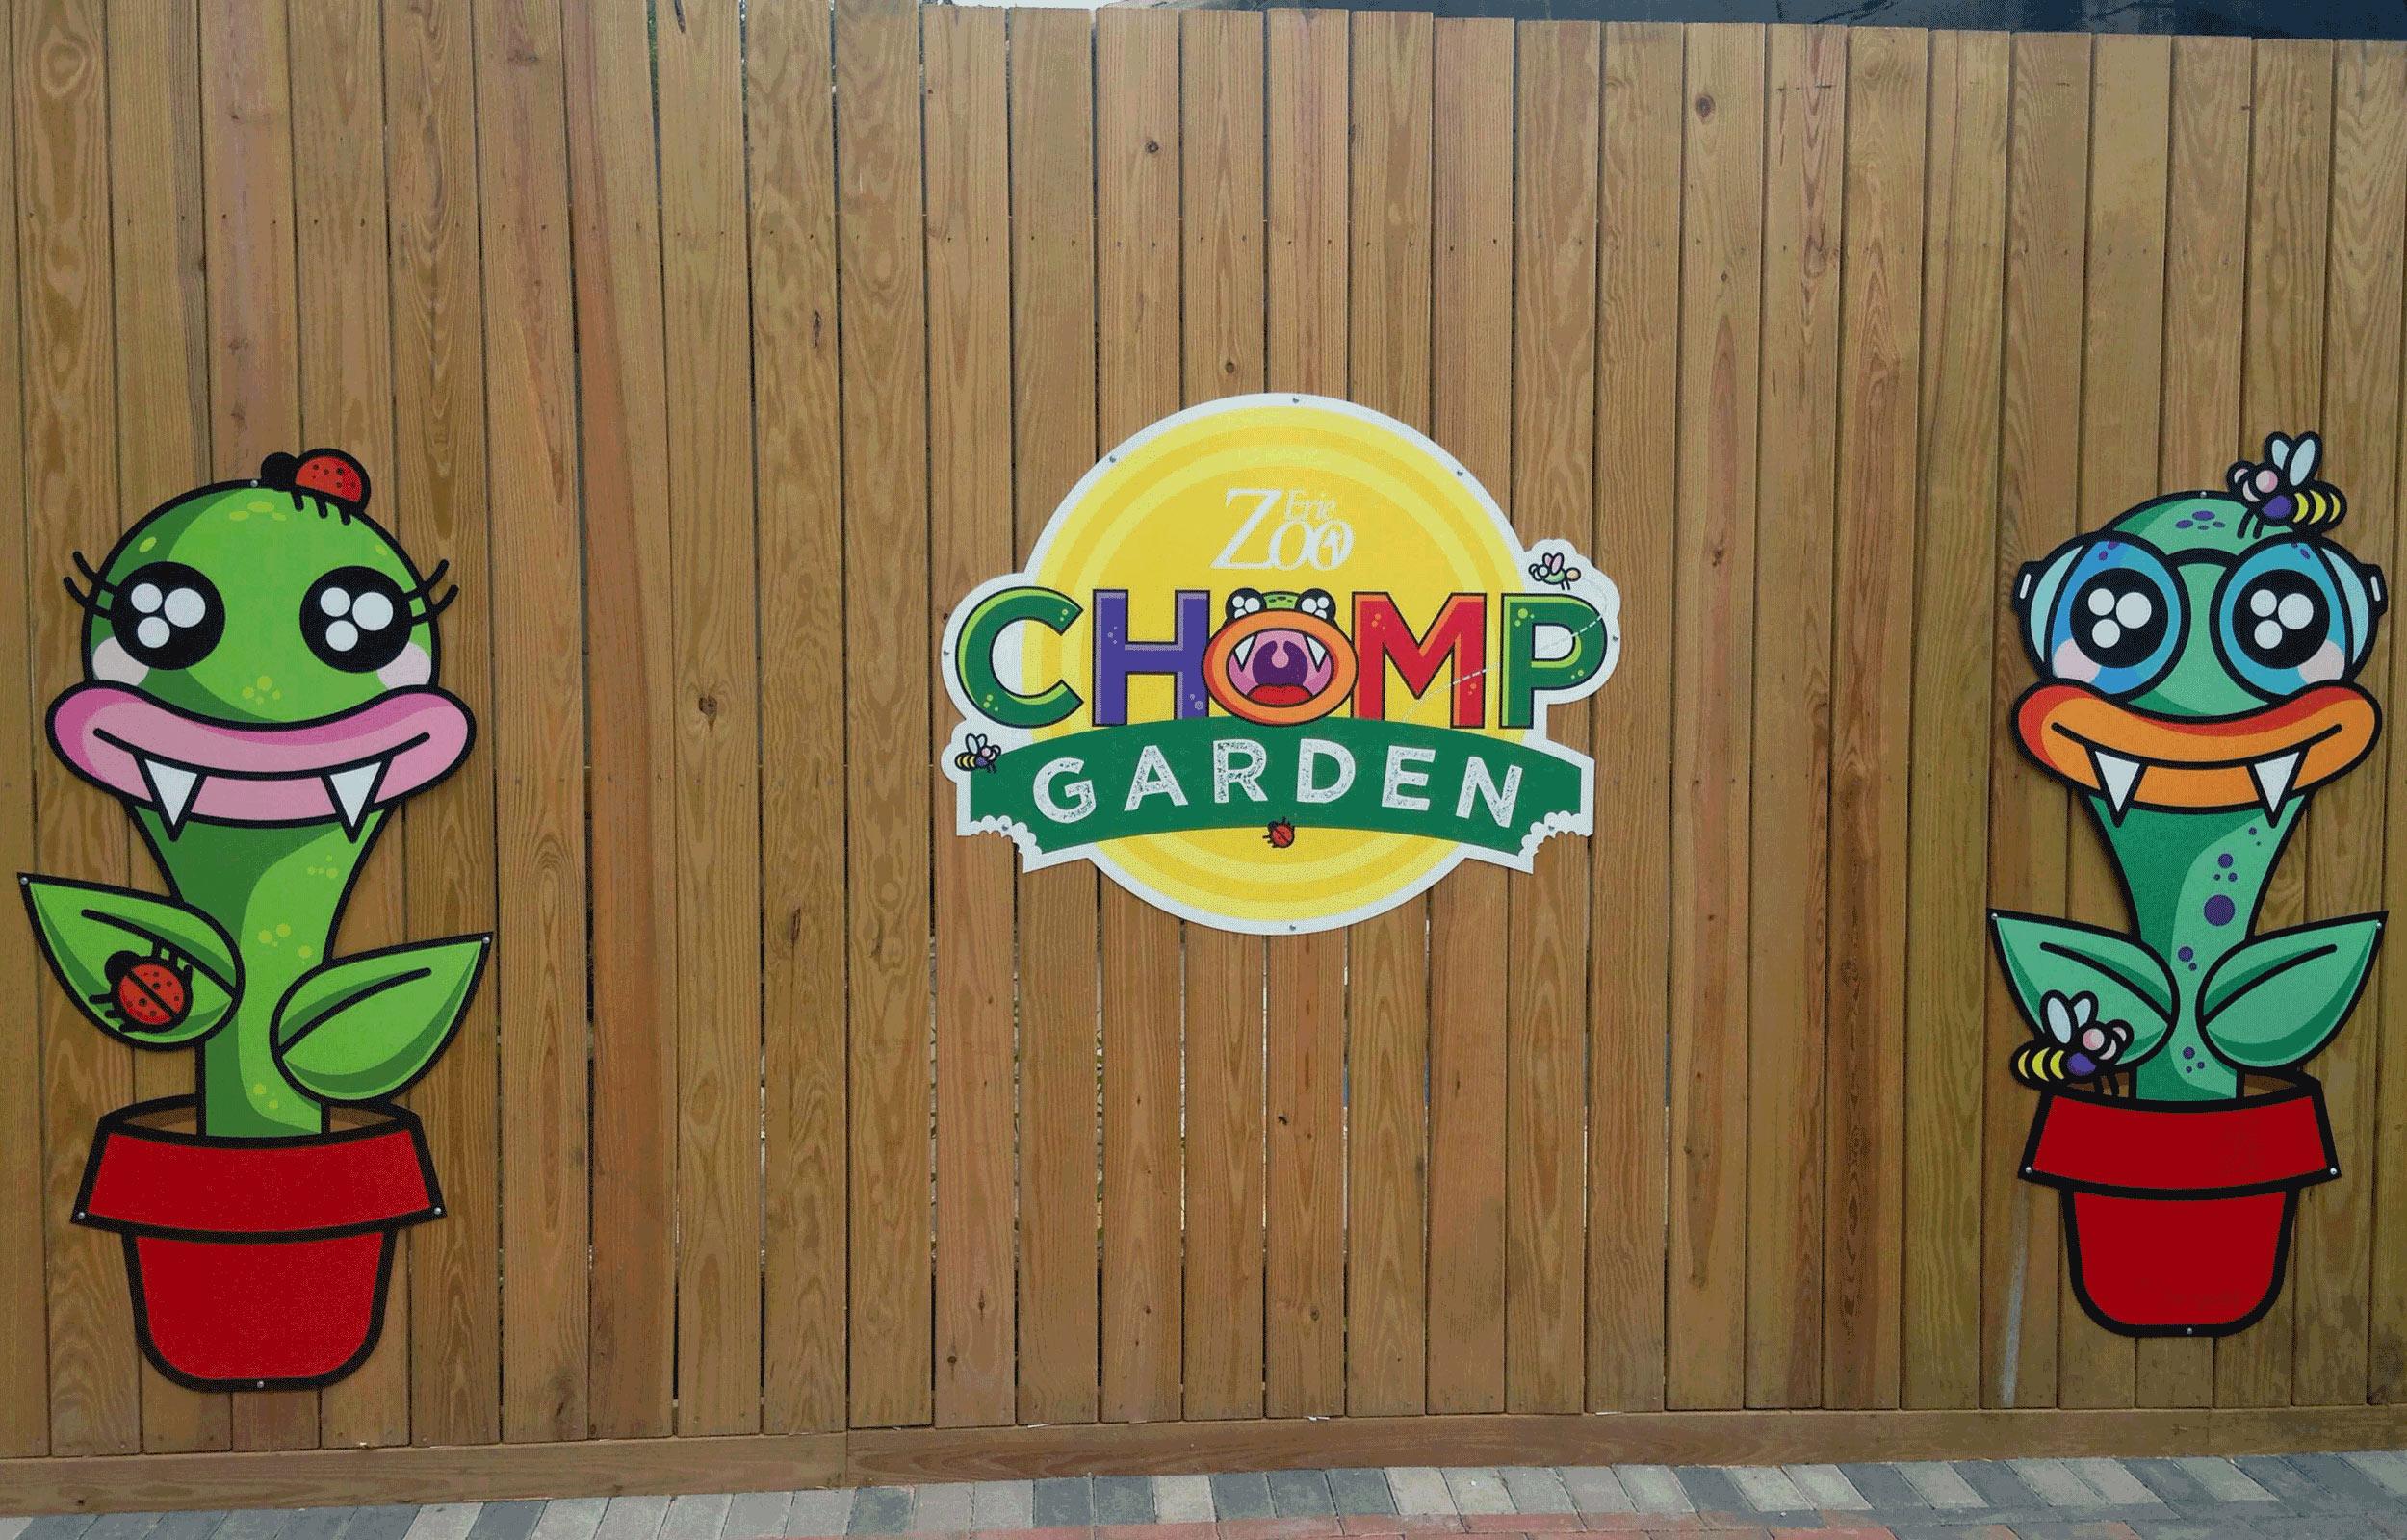 http://papaadvertising.com/wp-content/uploads/2015/10/chomp_garden_characters1.jpg